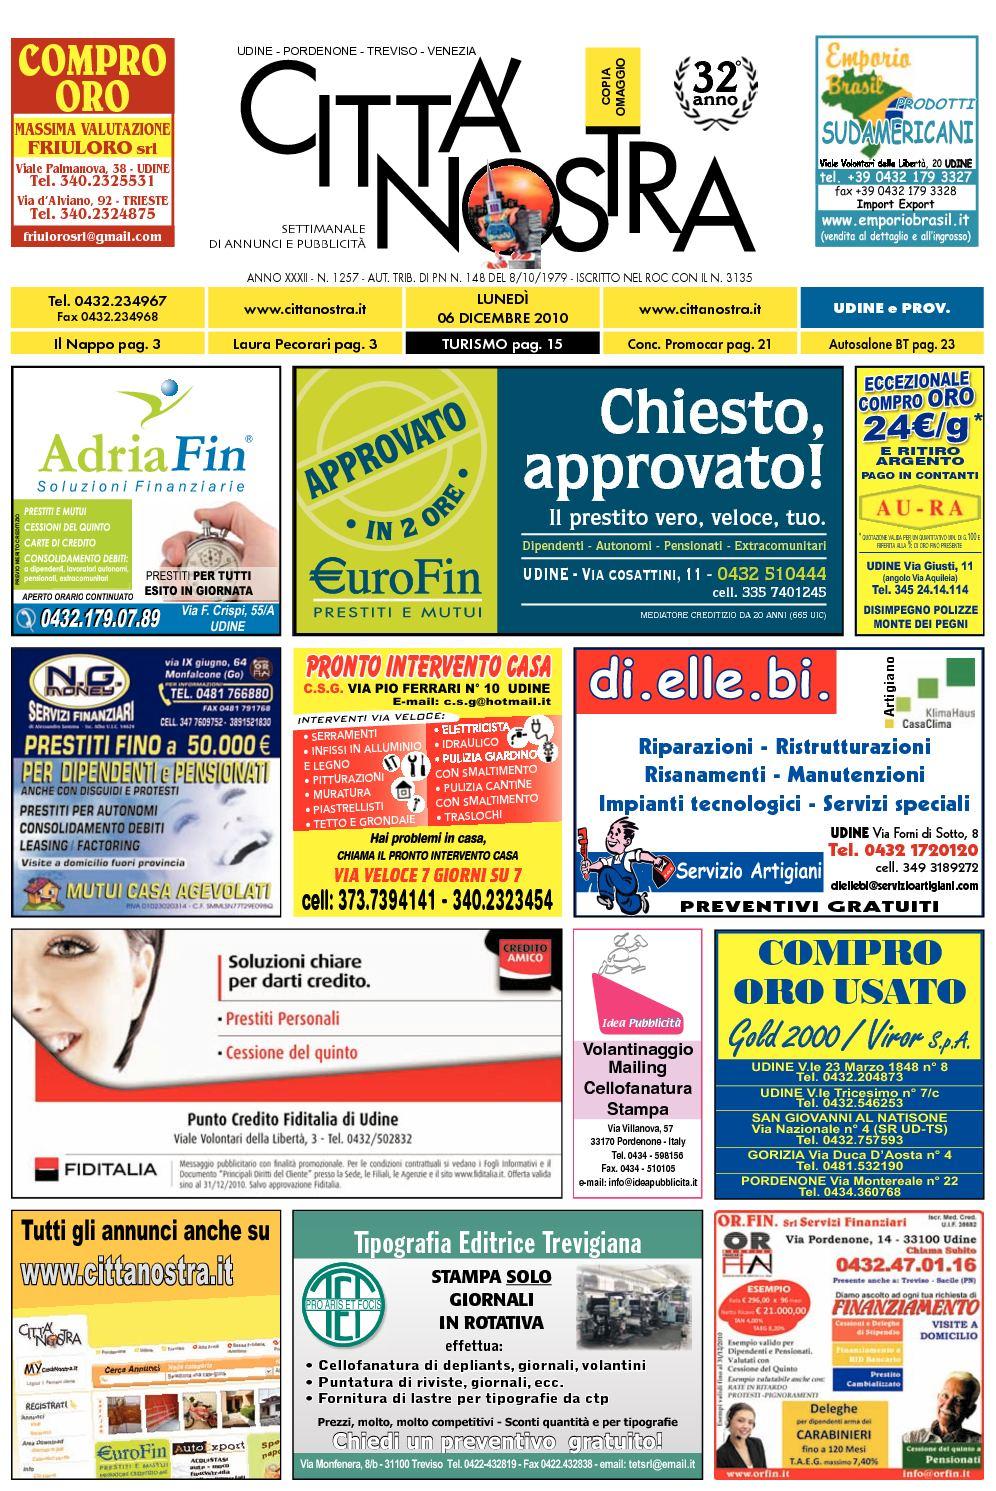 Calaméo - Città Nostra Udine del 06.12.2010 n. 1257 39324fa914a